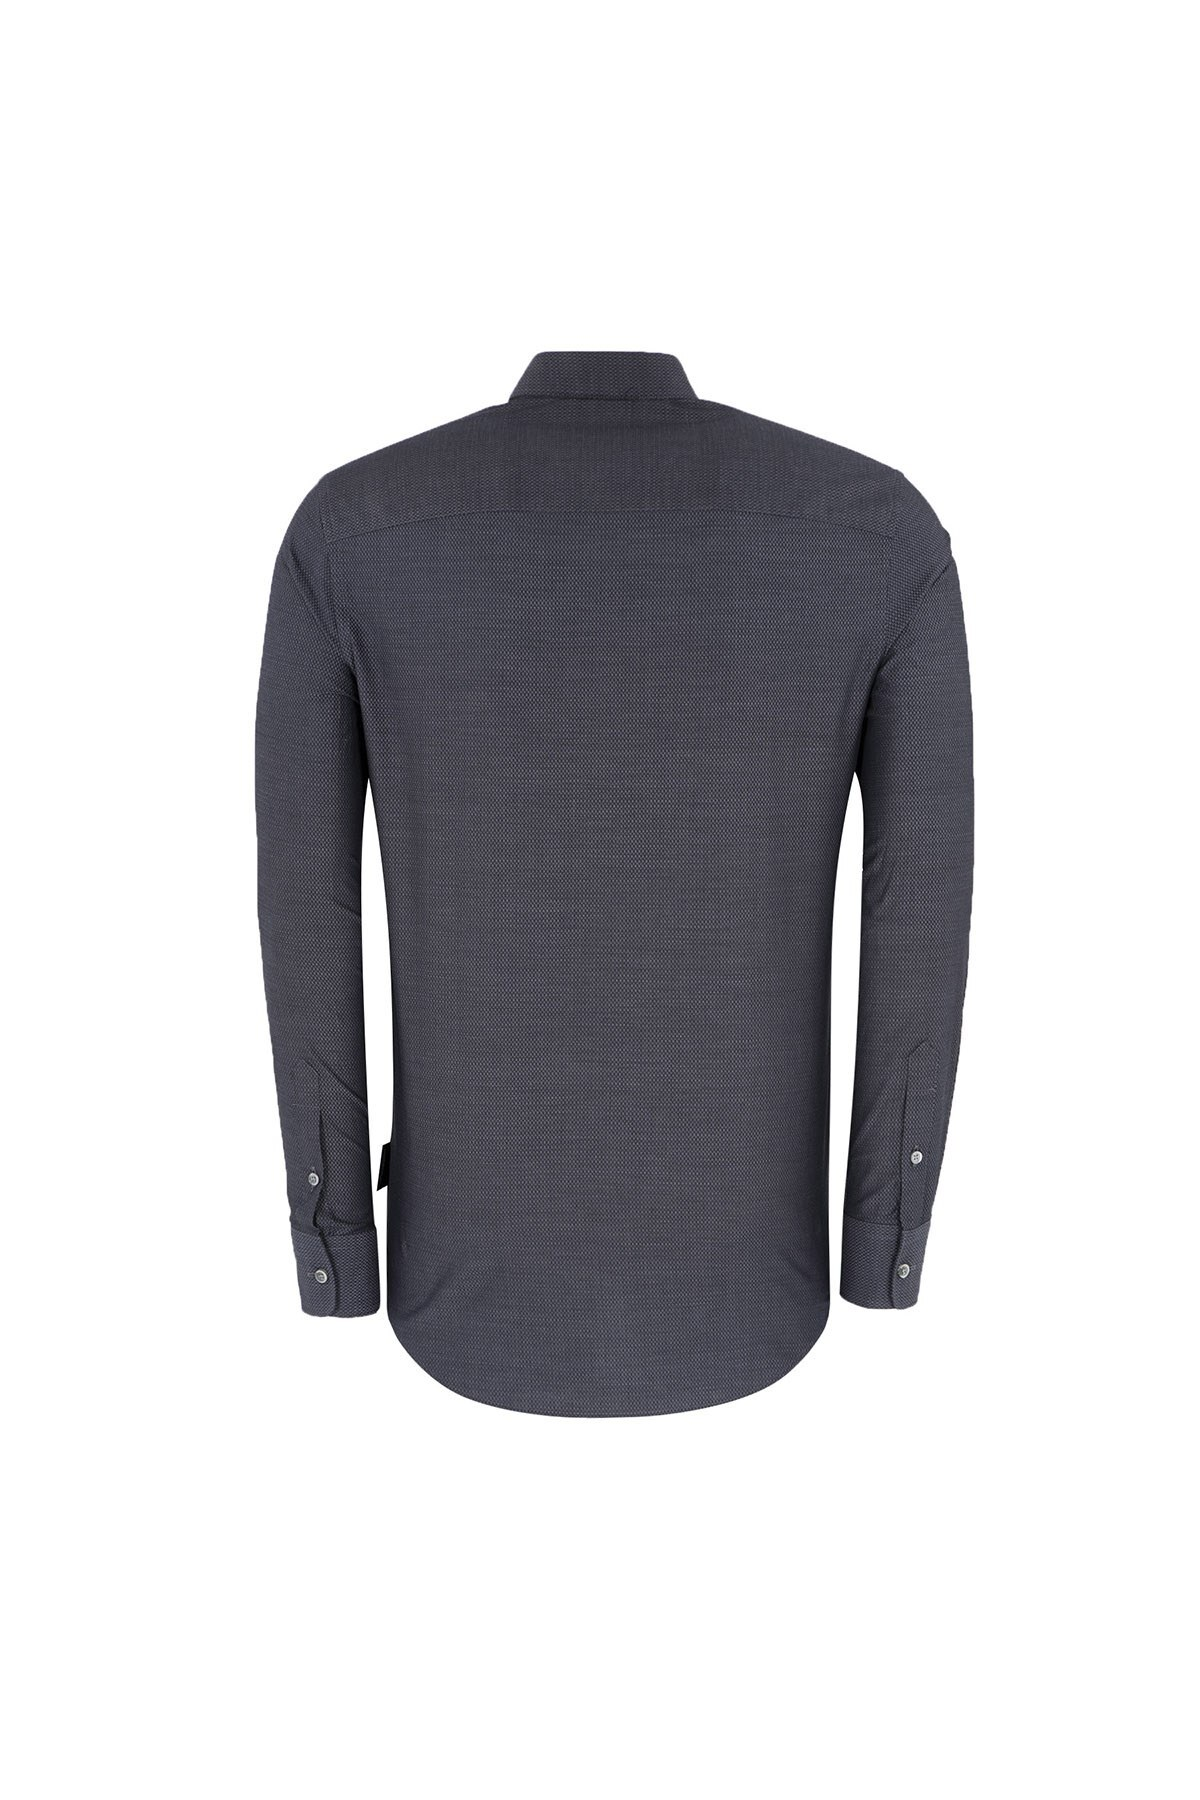 EMPORIO ARMANI Erkek Gömlek 11SMRL 115F0 042 ANTRASİT